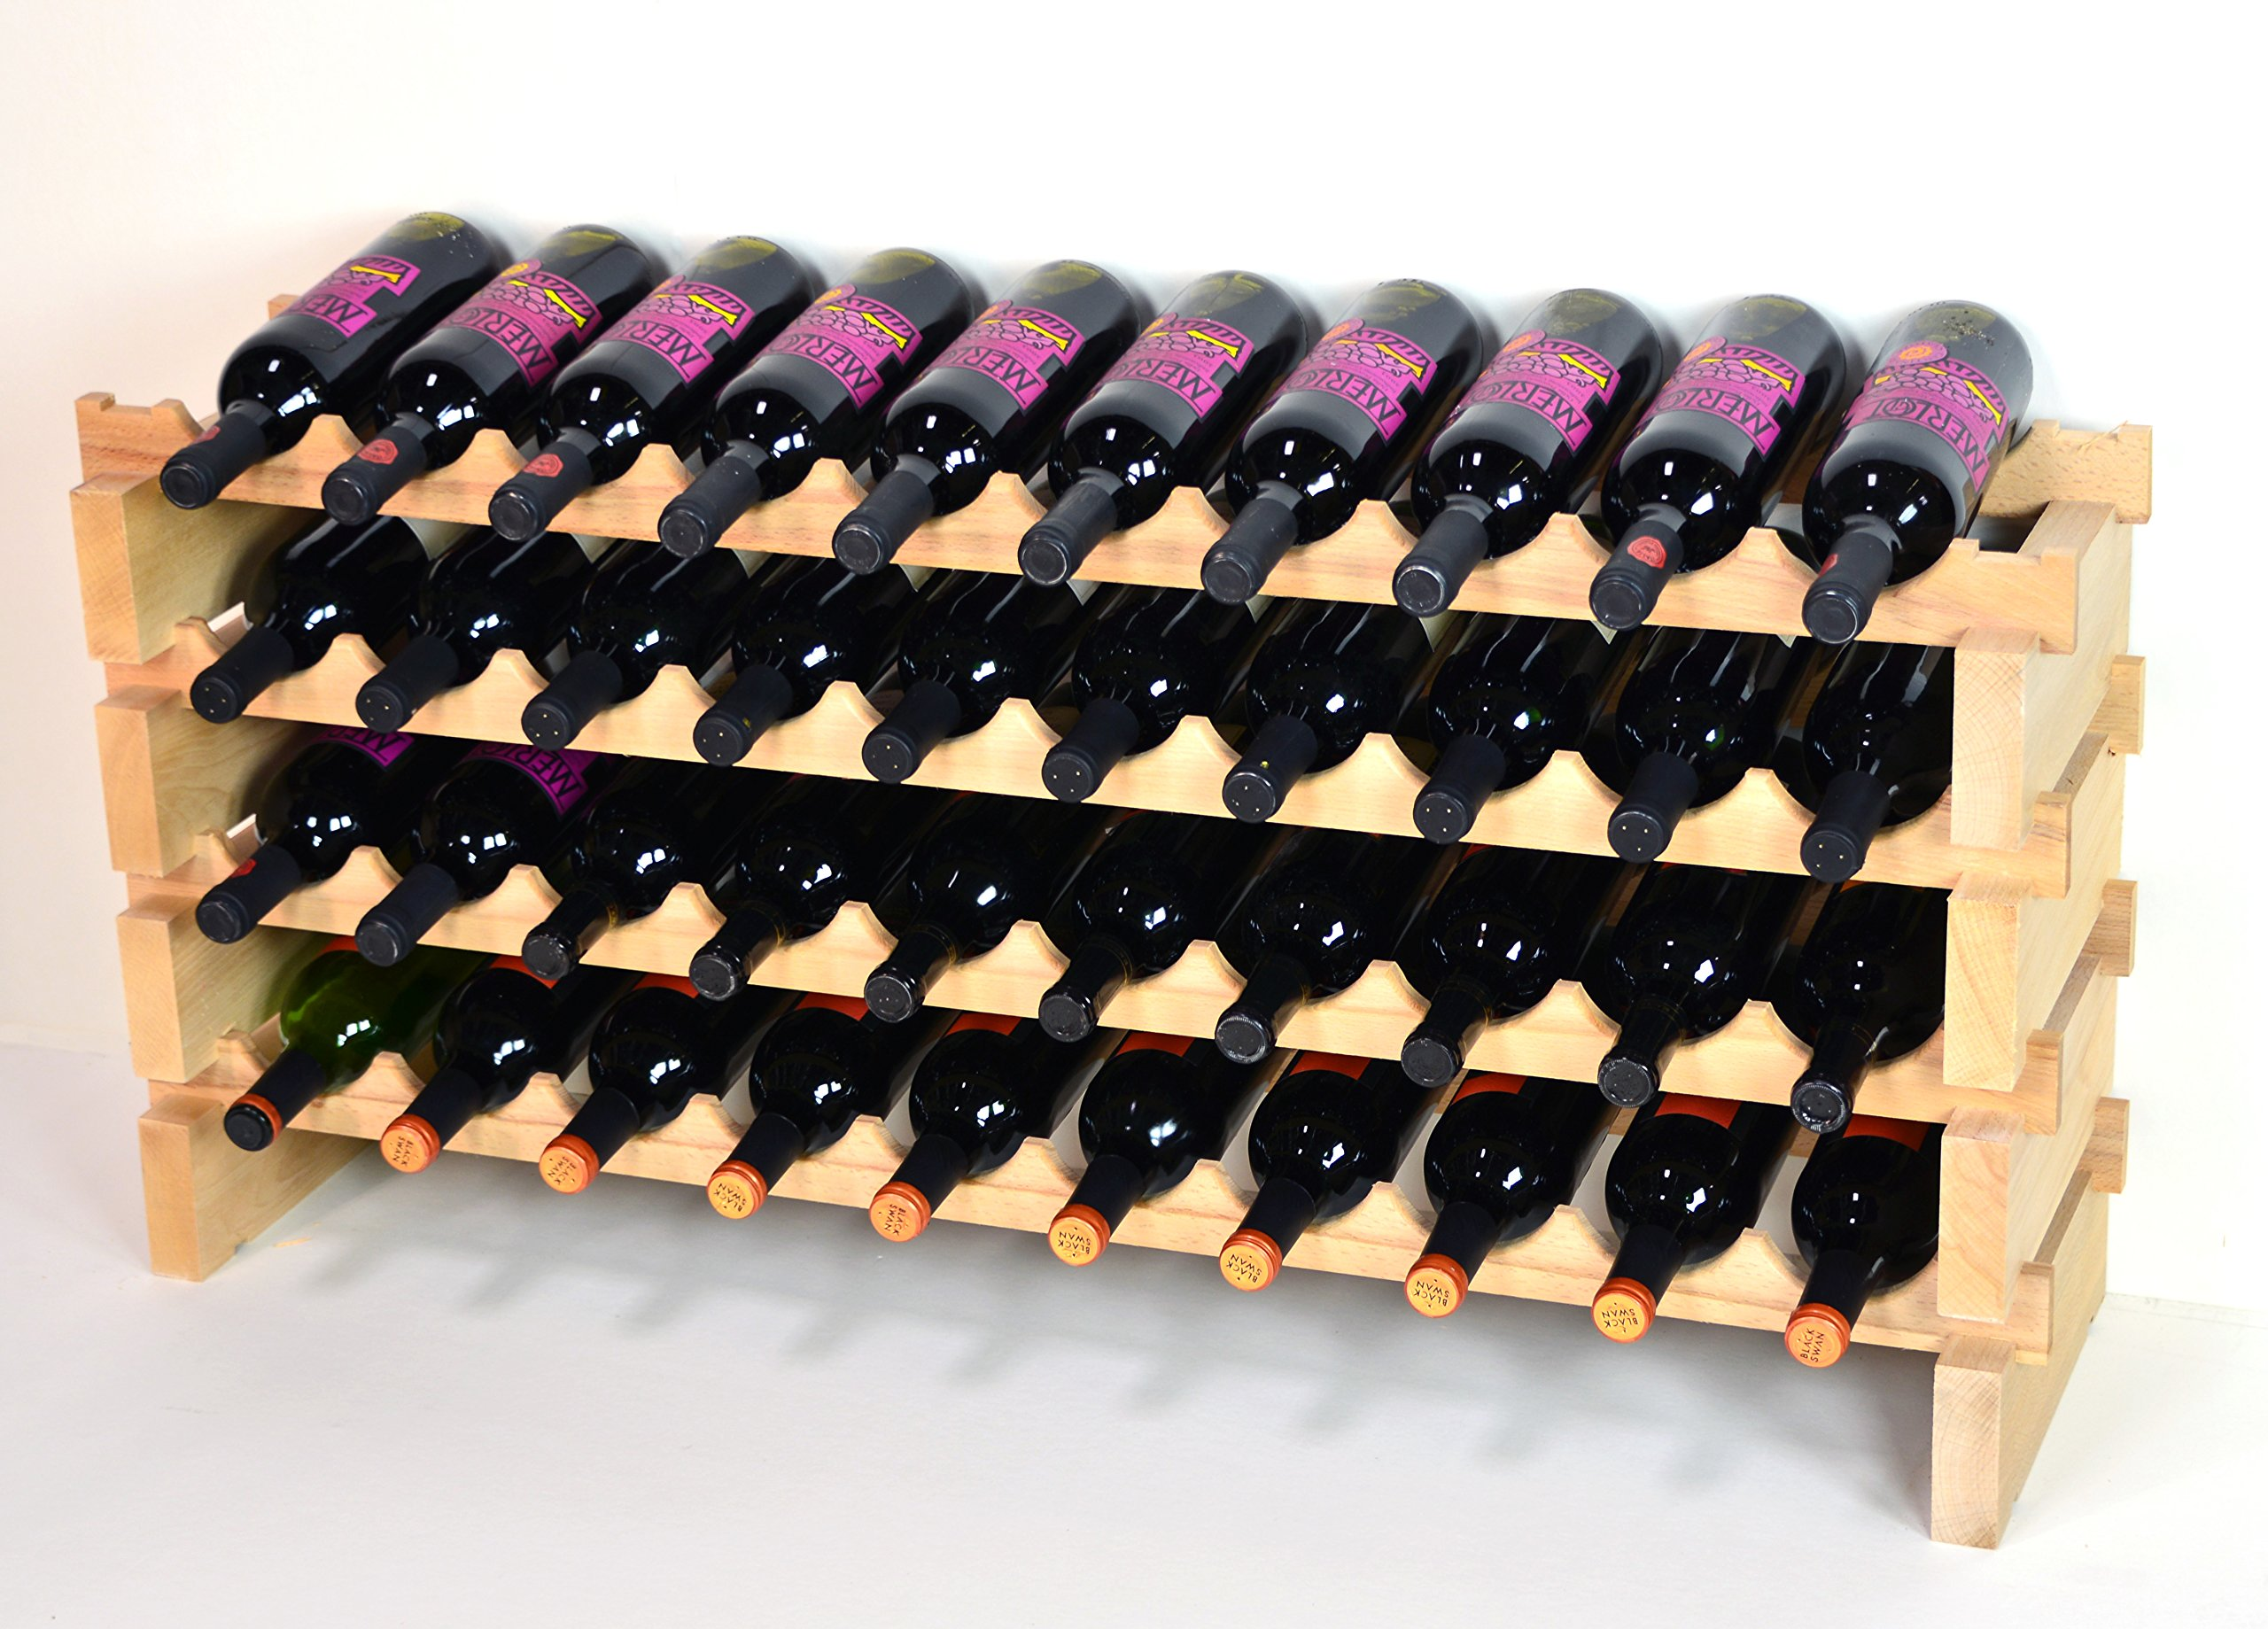 Modular Wine Rack Beechwood 40-120 Bottle Capacity 10 Bottles Across up to 12 Rows Newest Improved Model (40 Bottles - 4 Rows)